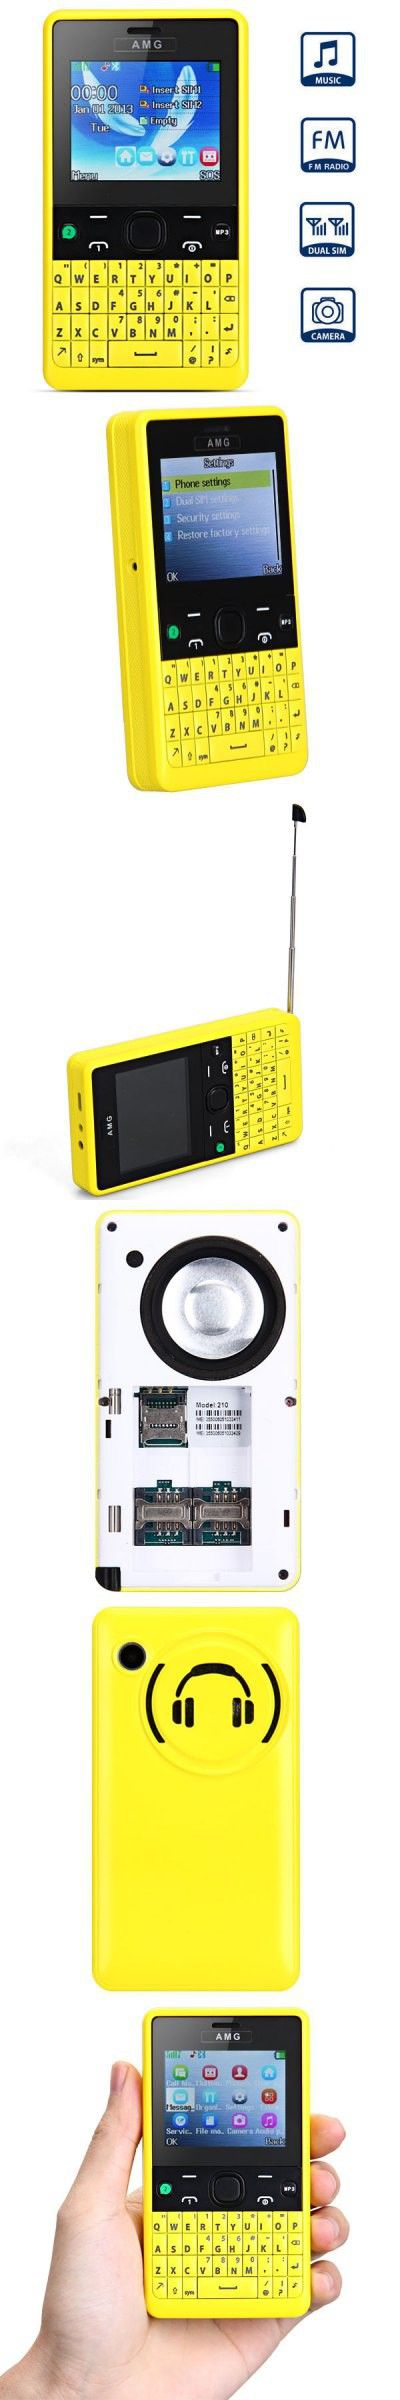 2.2 inch 210 Quad Band Cell Phone Dual SIM Big Speaker Big Battery FM Radio